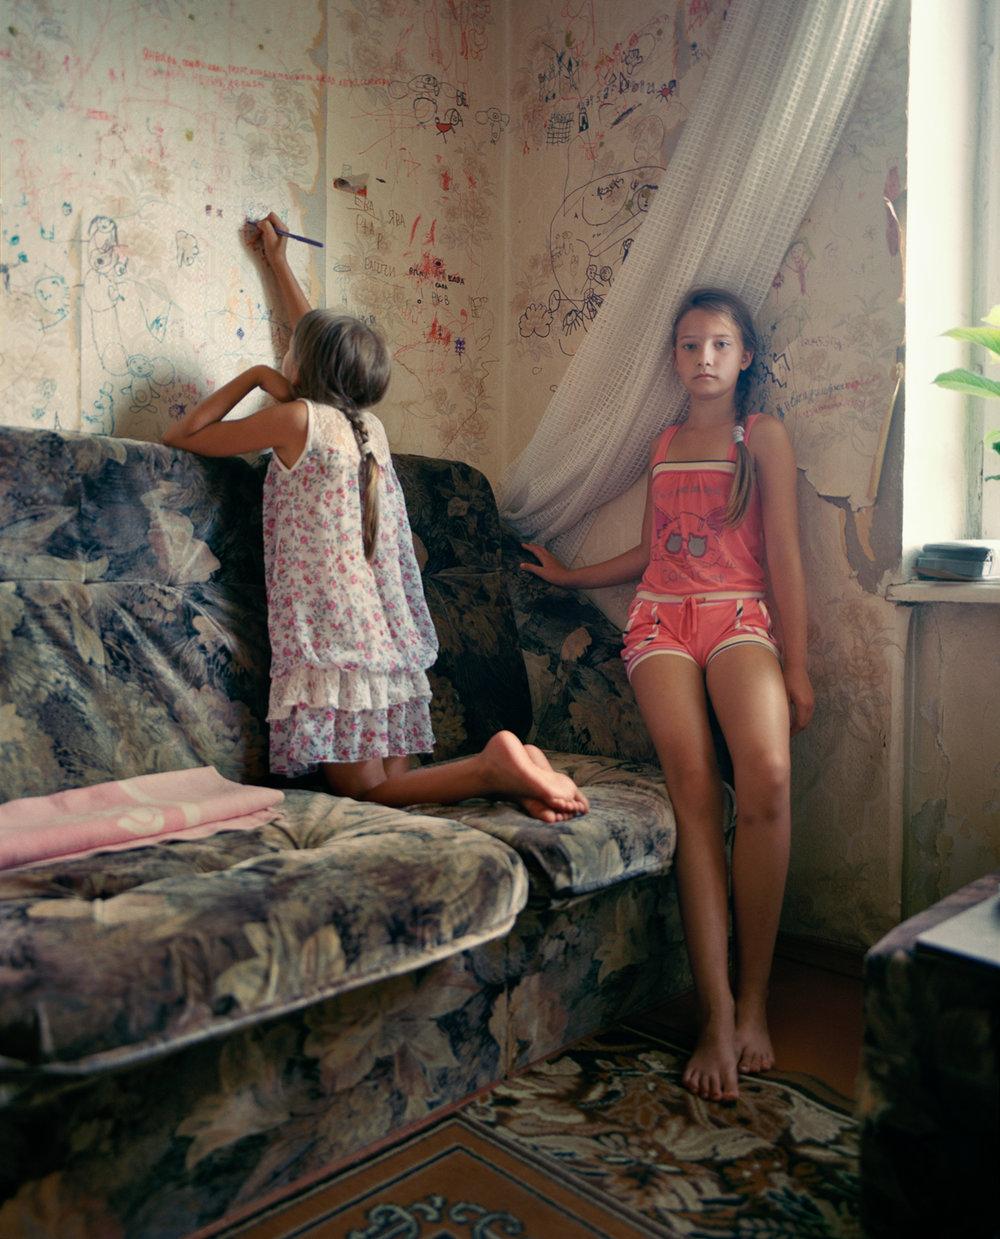 Sasha and Veronika, Lodeynoye Pole, Russia, 2013, Nadia Sablin